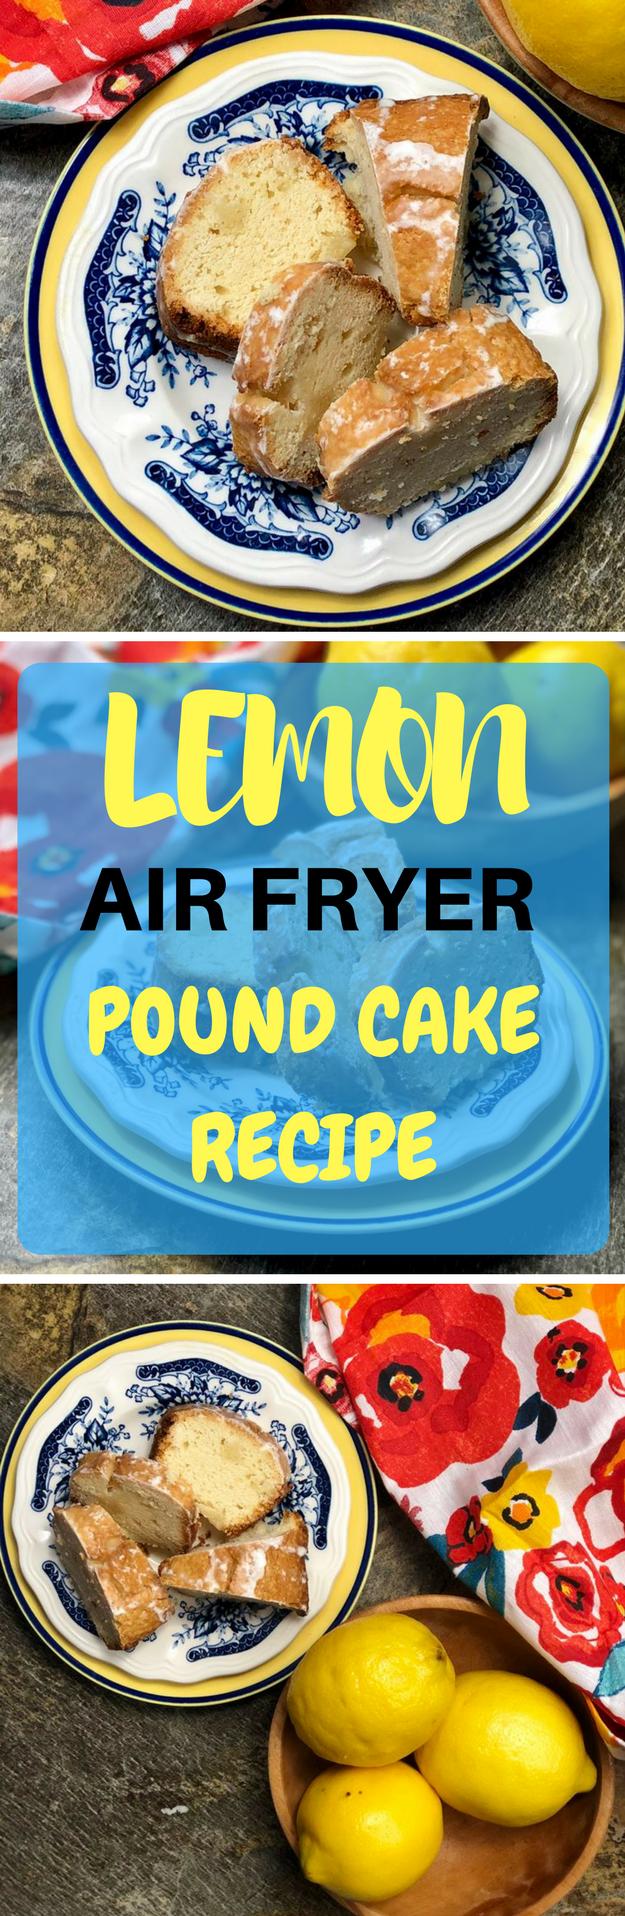 Lemon Drizzle Cake Calories Per Slice